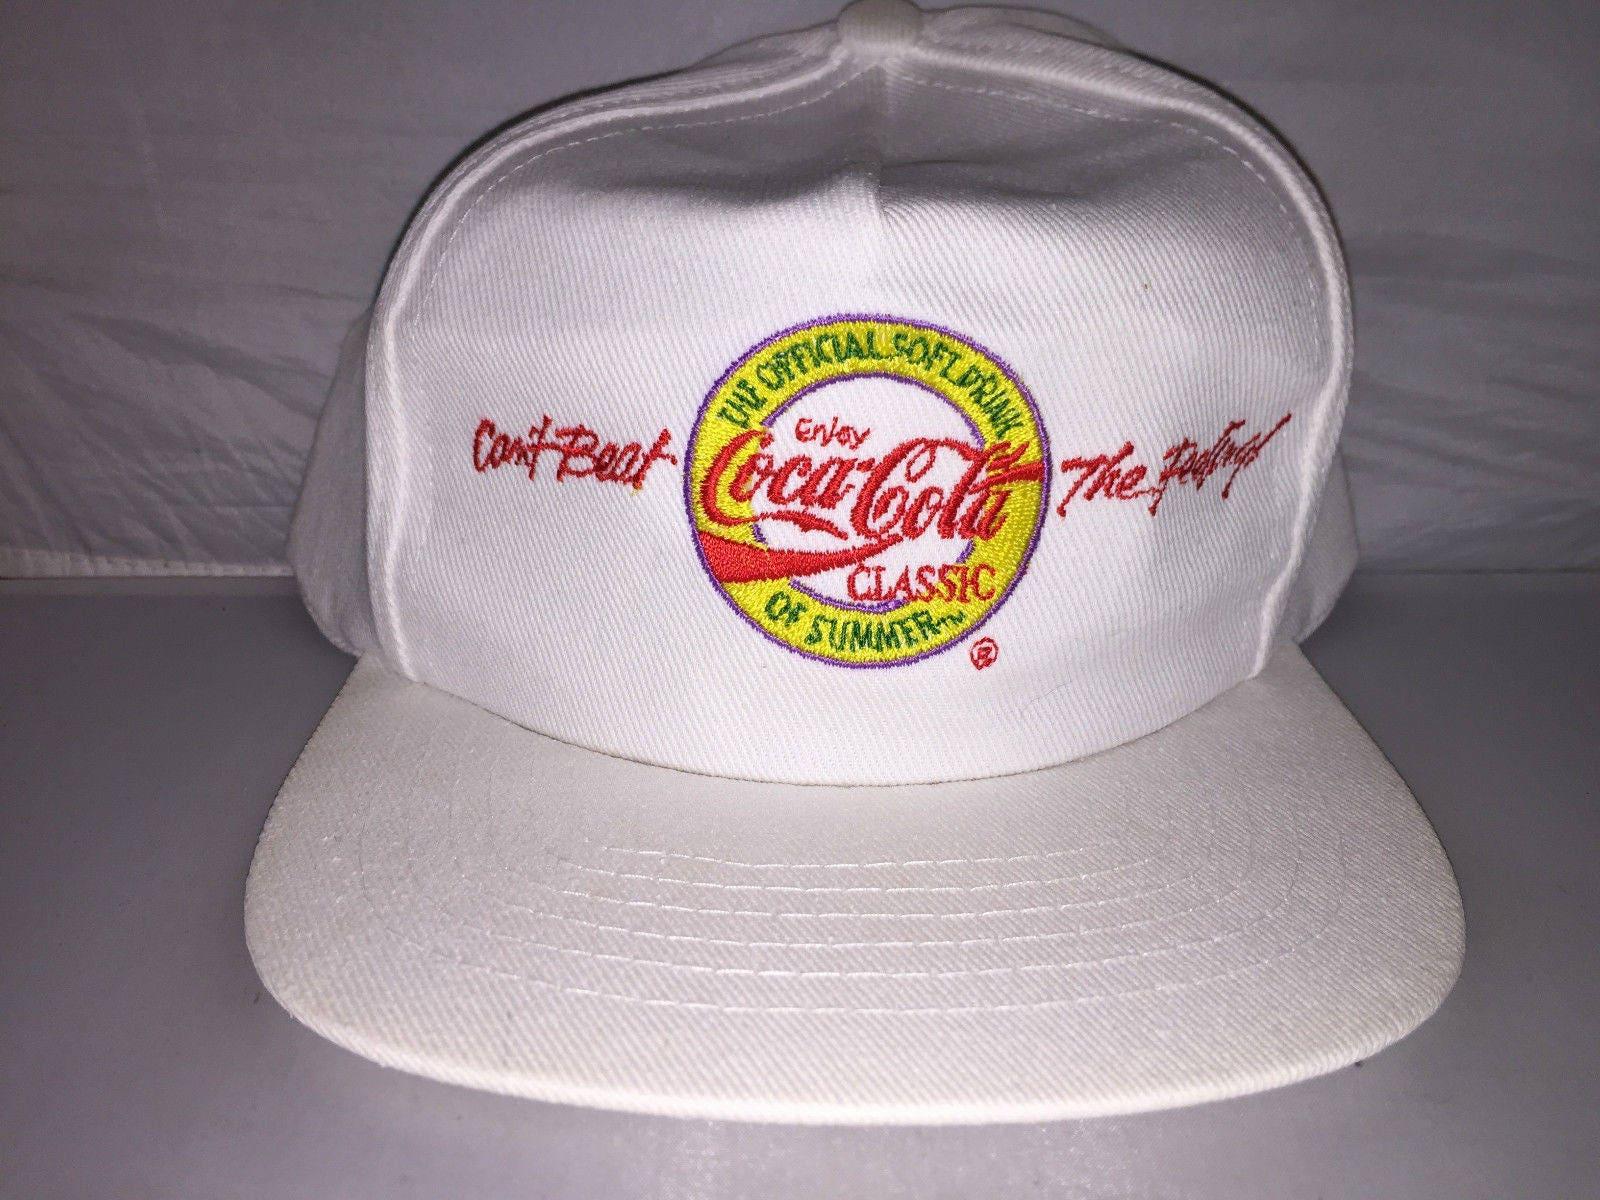 Vintage Coca Cola Snapback hat cap rare 90s soda coke hipster  024e45dd18d8